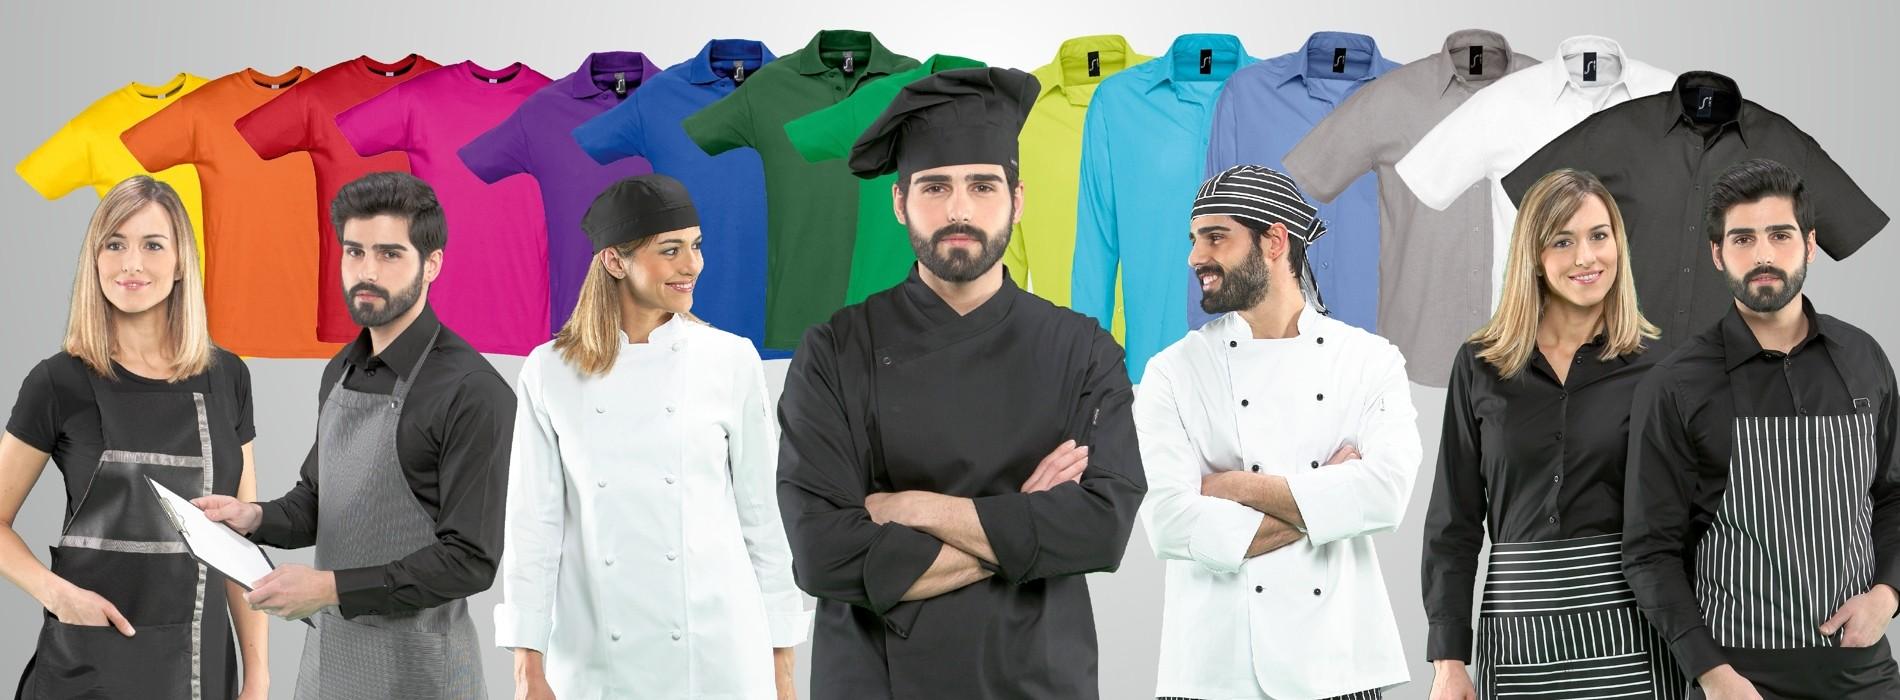 Uniformes Laborals